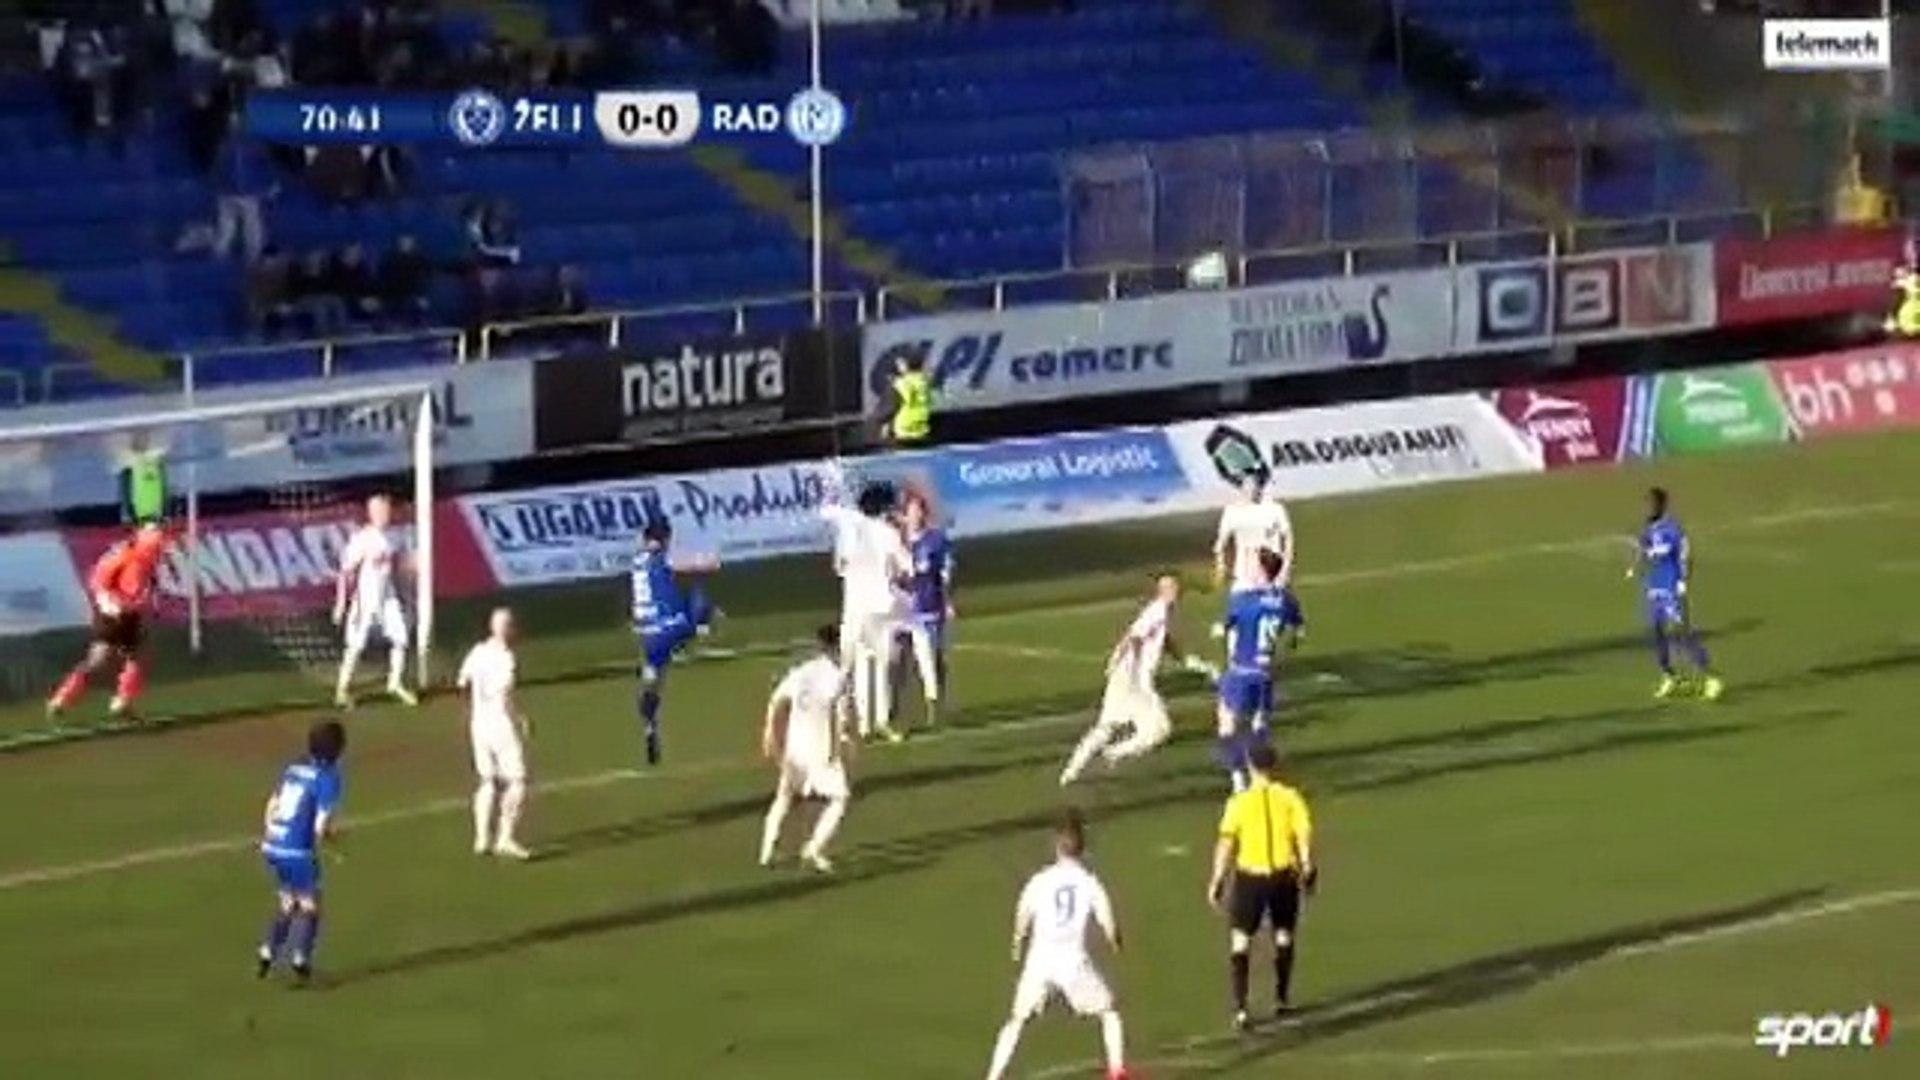 Zeljeznicar 1:0 Radnik Bijeljina (Bosnian and Herzegovian Cup. 15 March 2017)